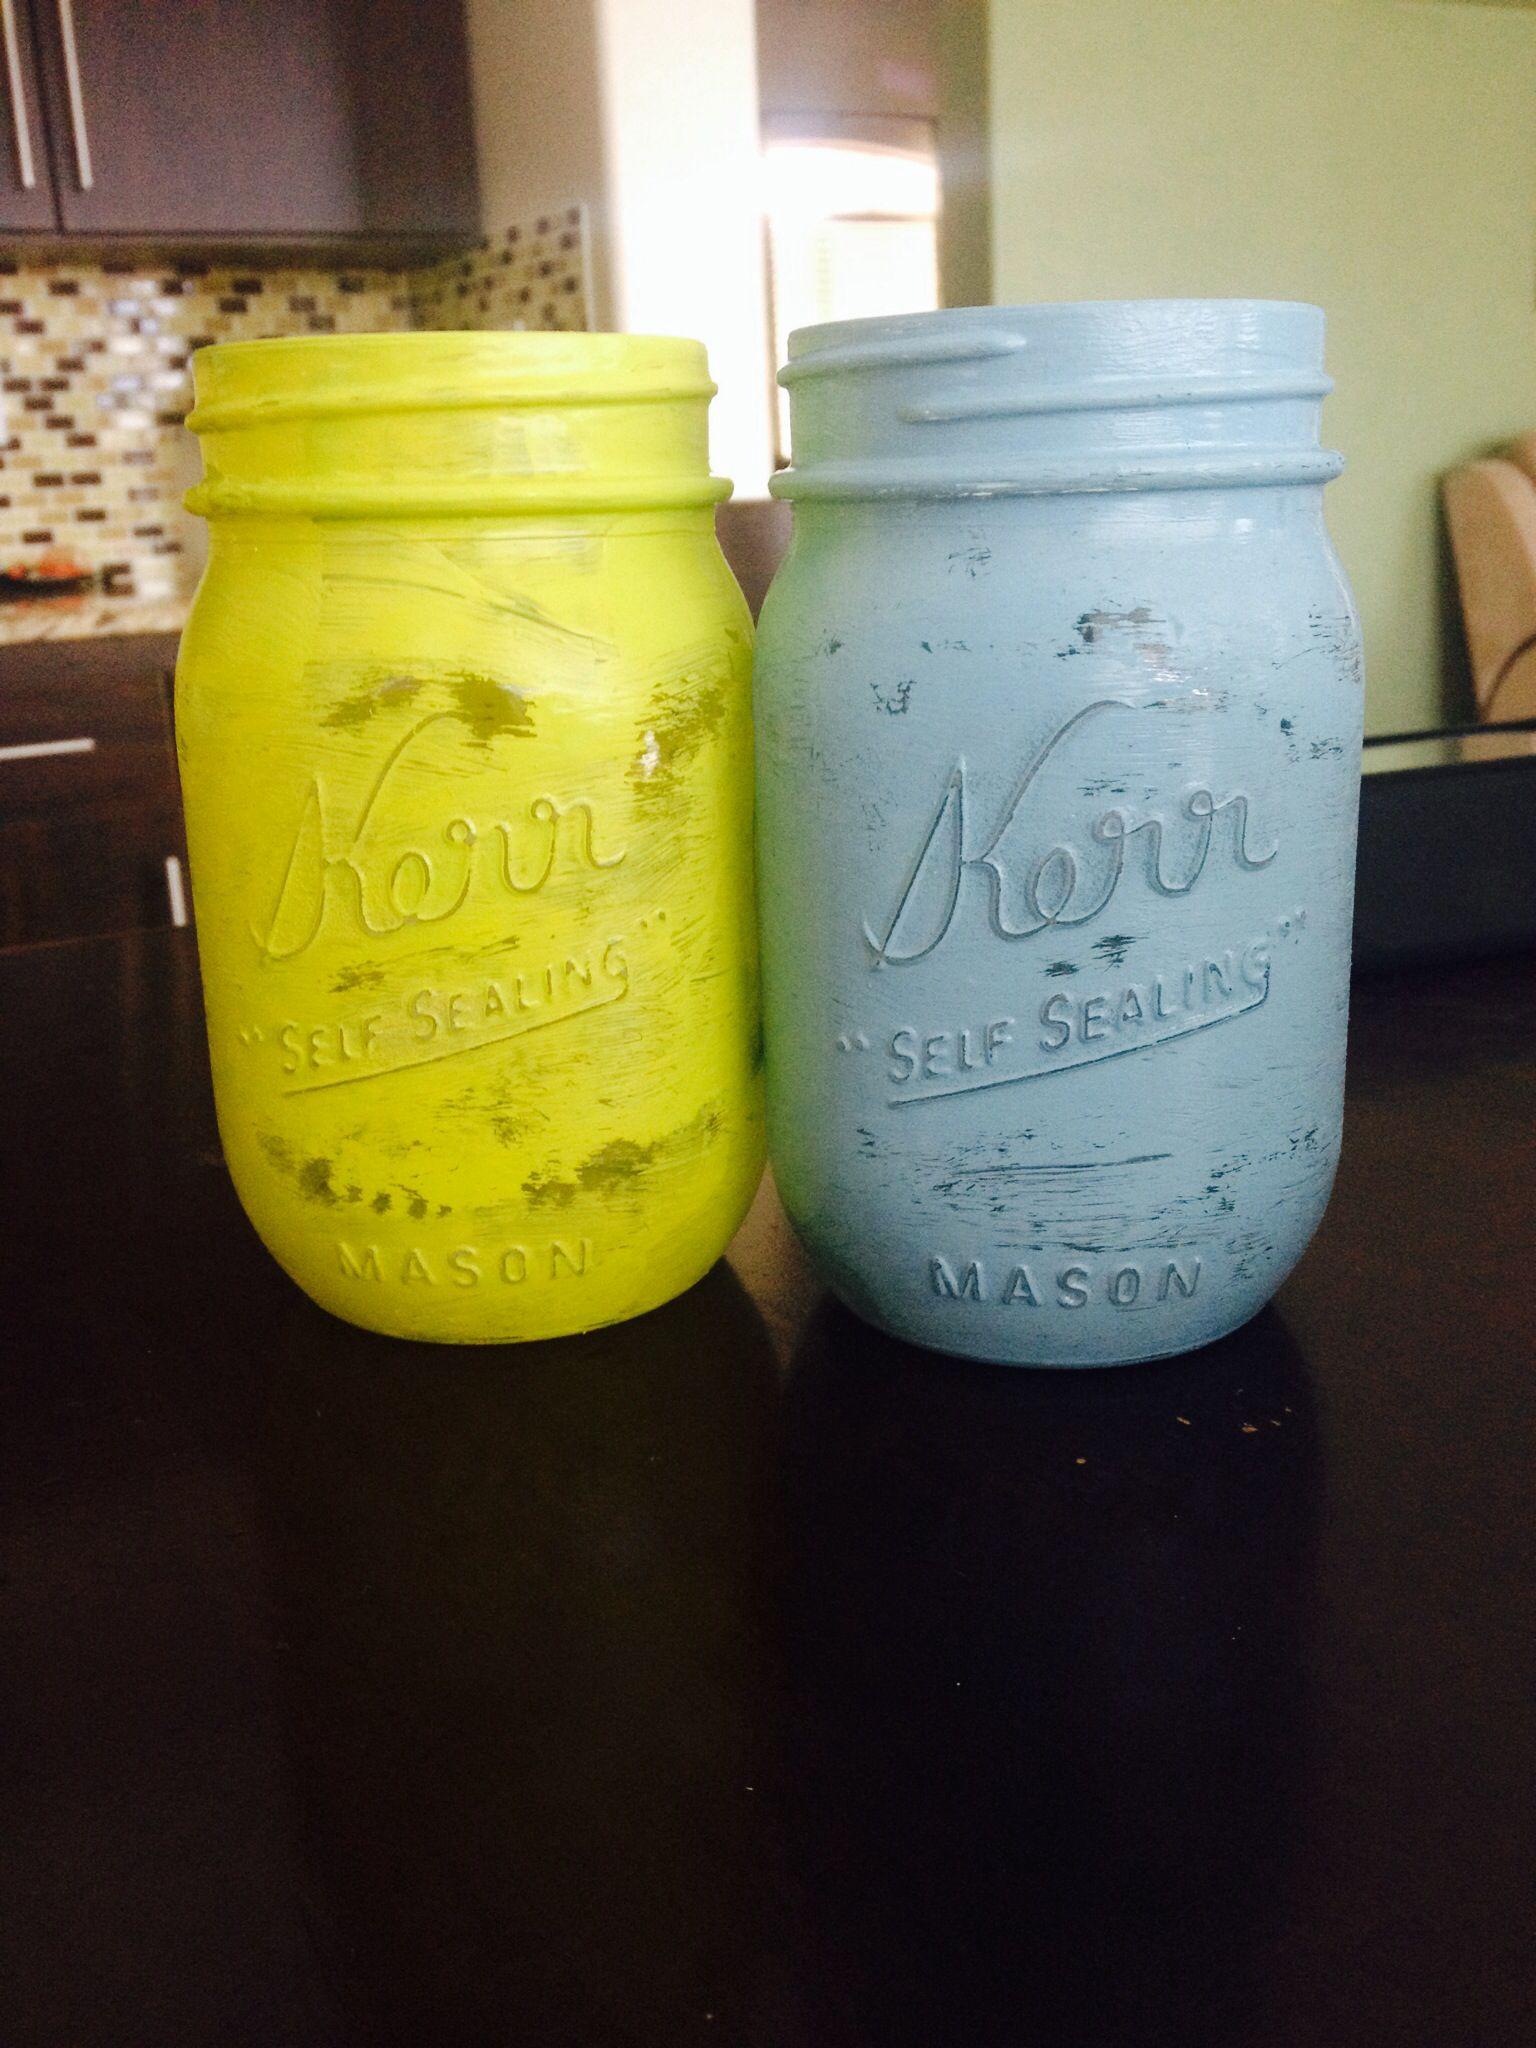 Mason jar diy crafts pinterest for Diy jar crafts